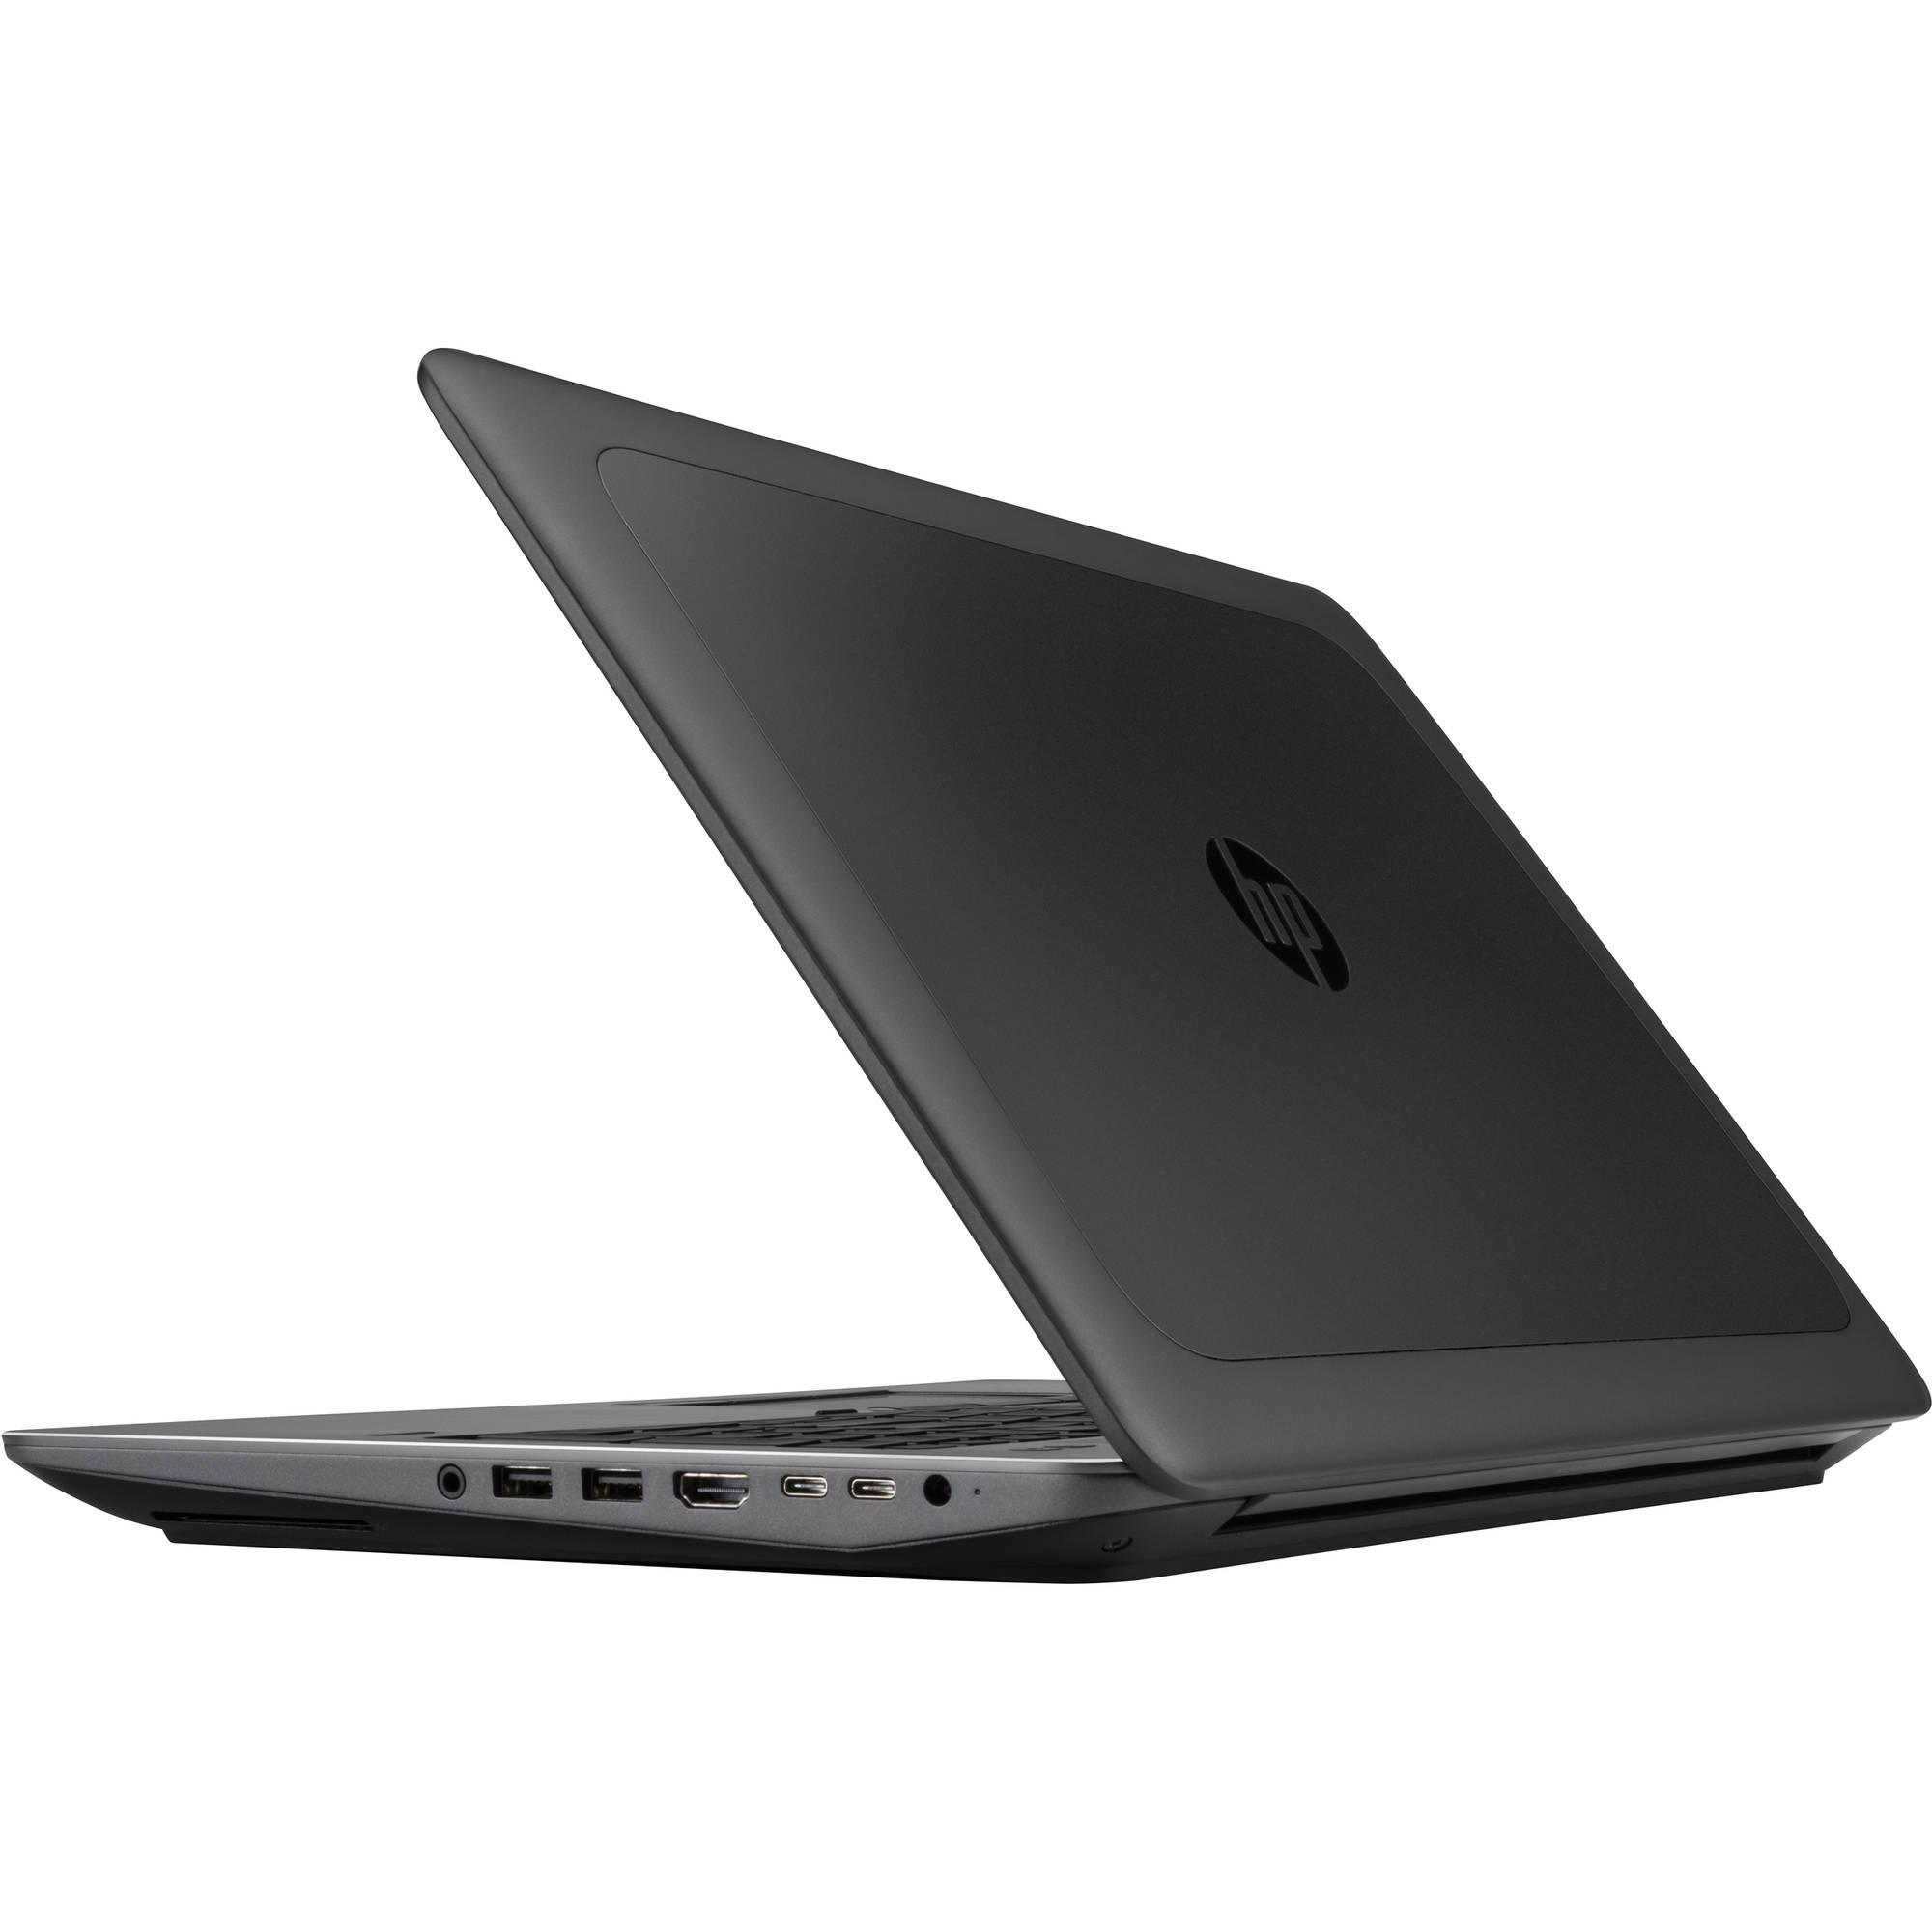 HP Zbook 15 G4 Laptop Intel Core I7 2.90 GHz 16Gb Ram 512GB SSD W10P - $747.99